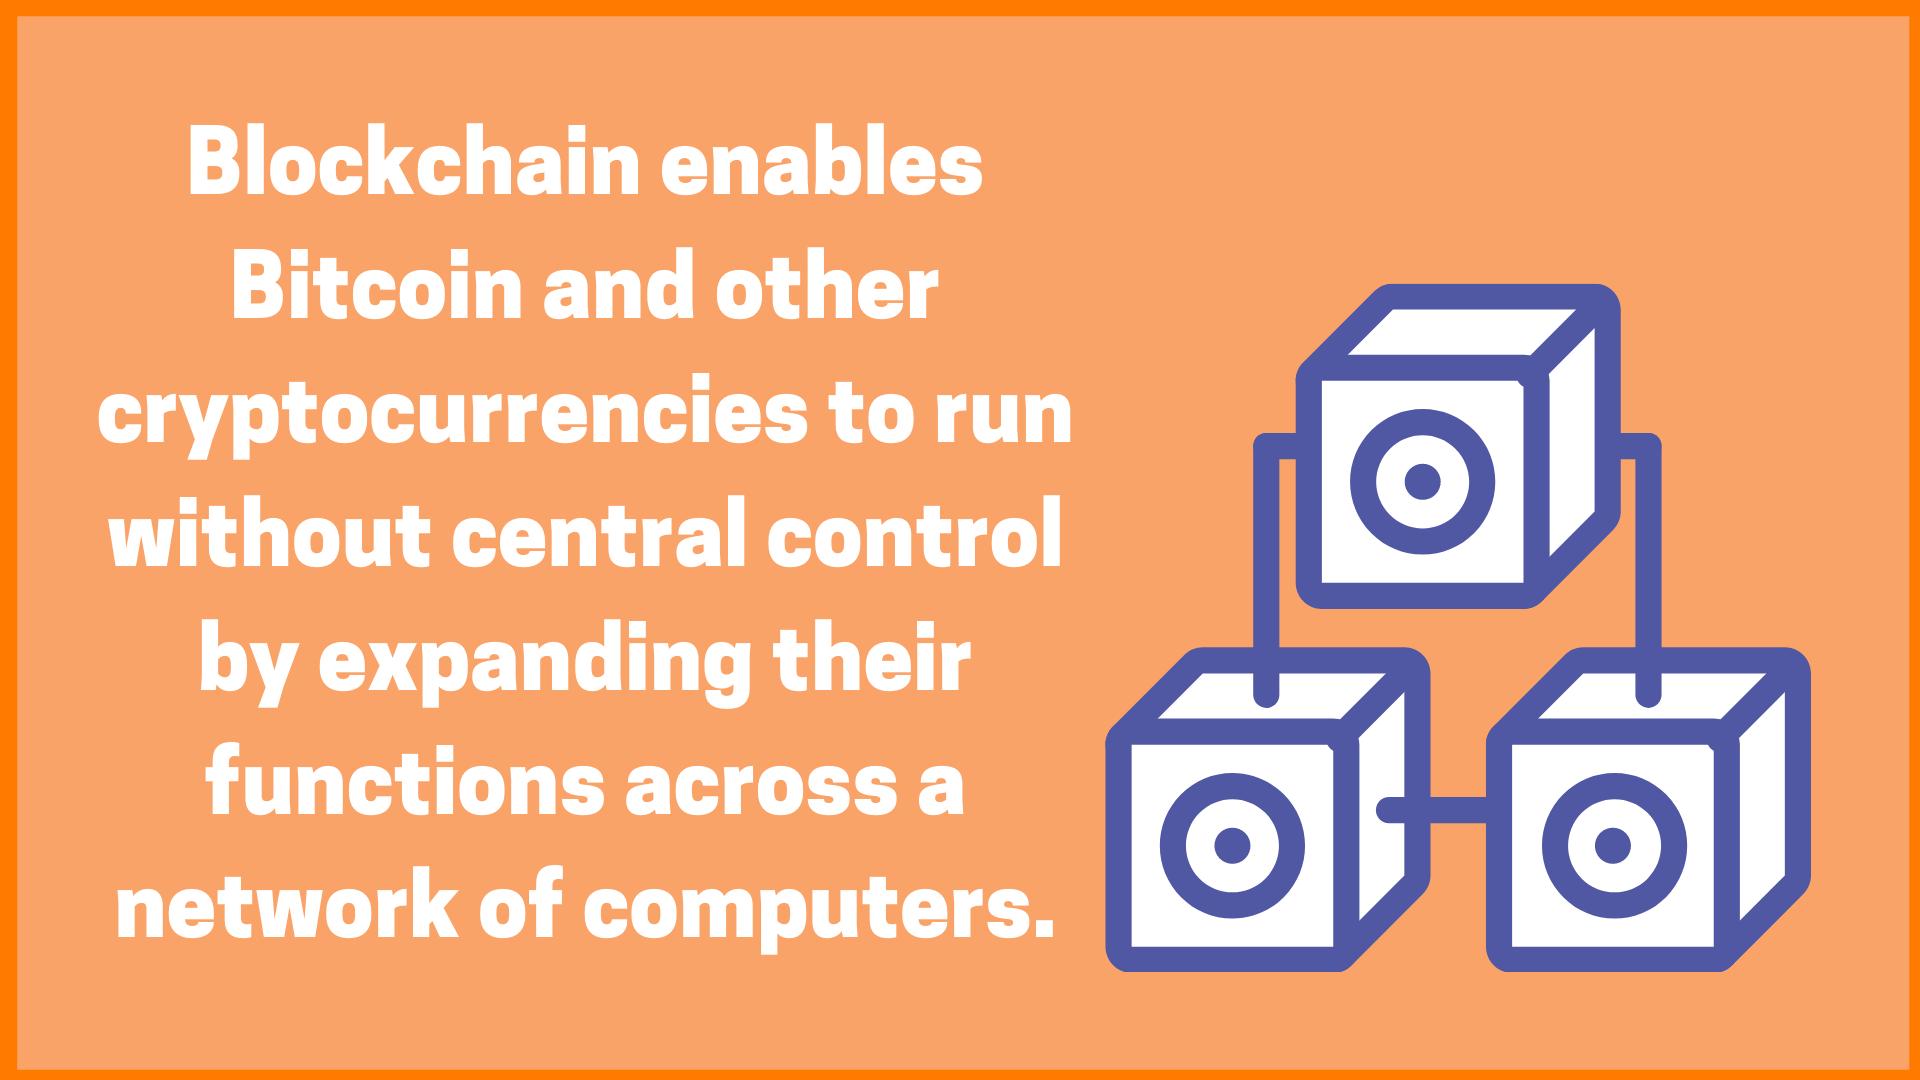 Blockchain Helps Bitcoin Functioning